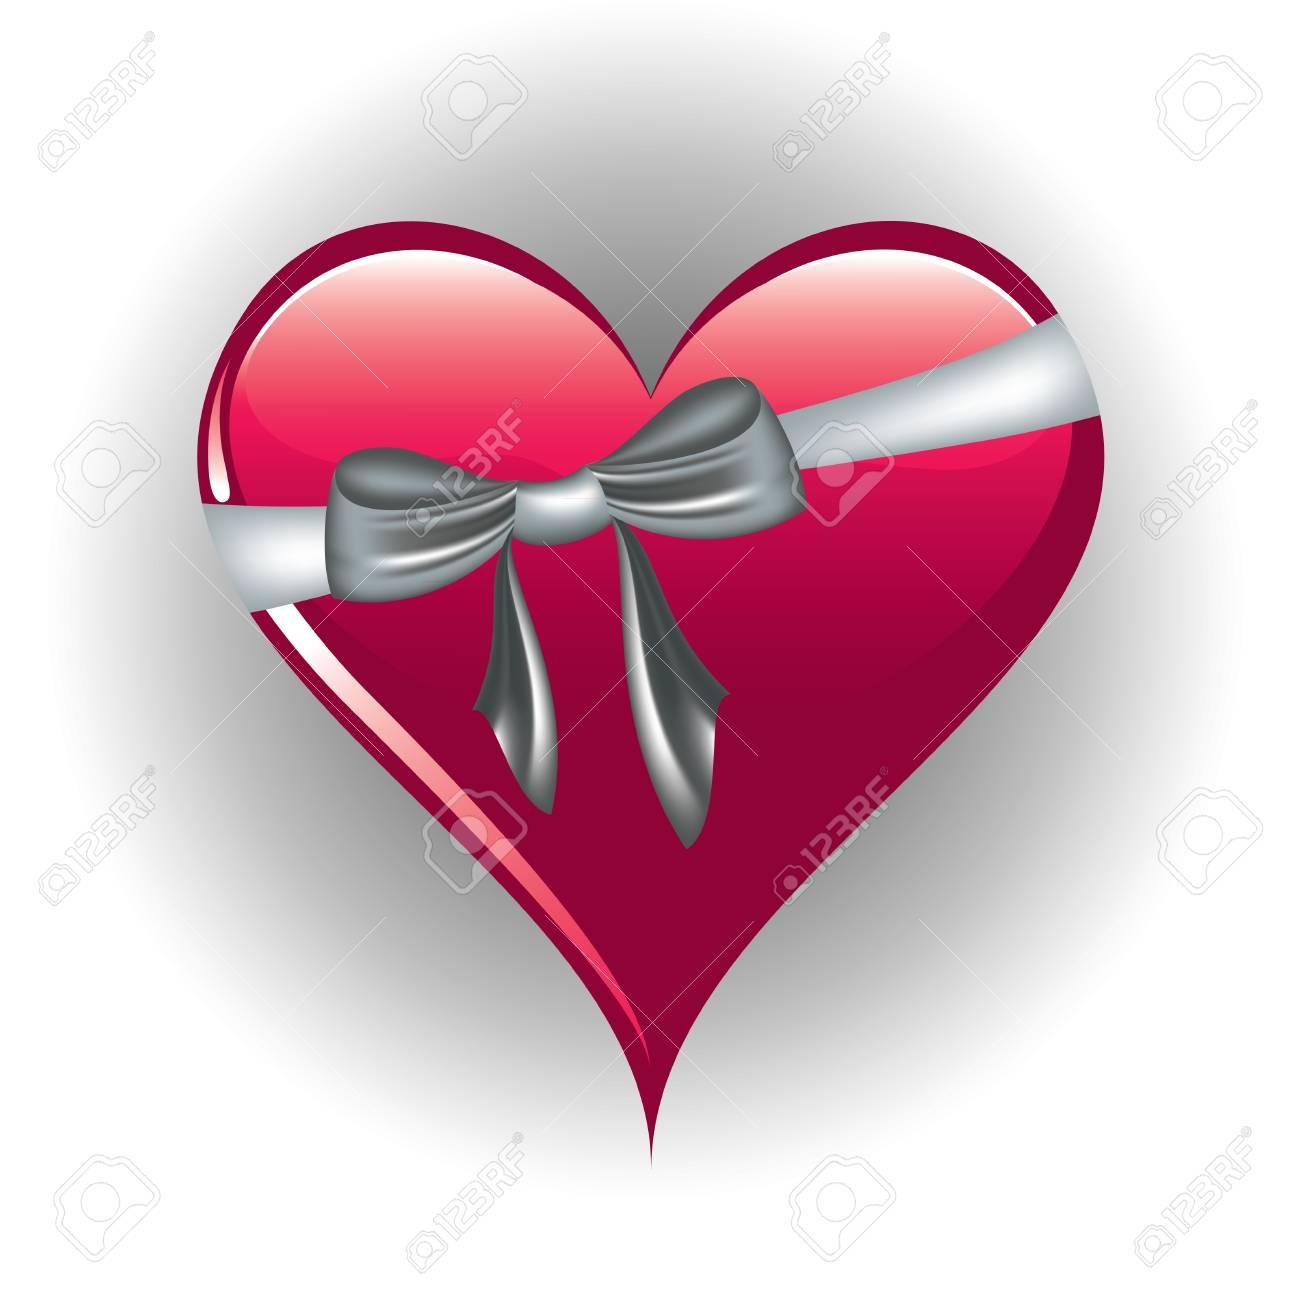 Heart  Illustration Stock Vector - 14550531